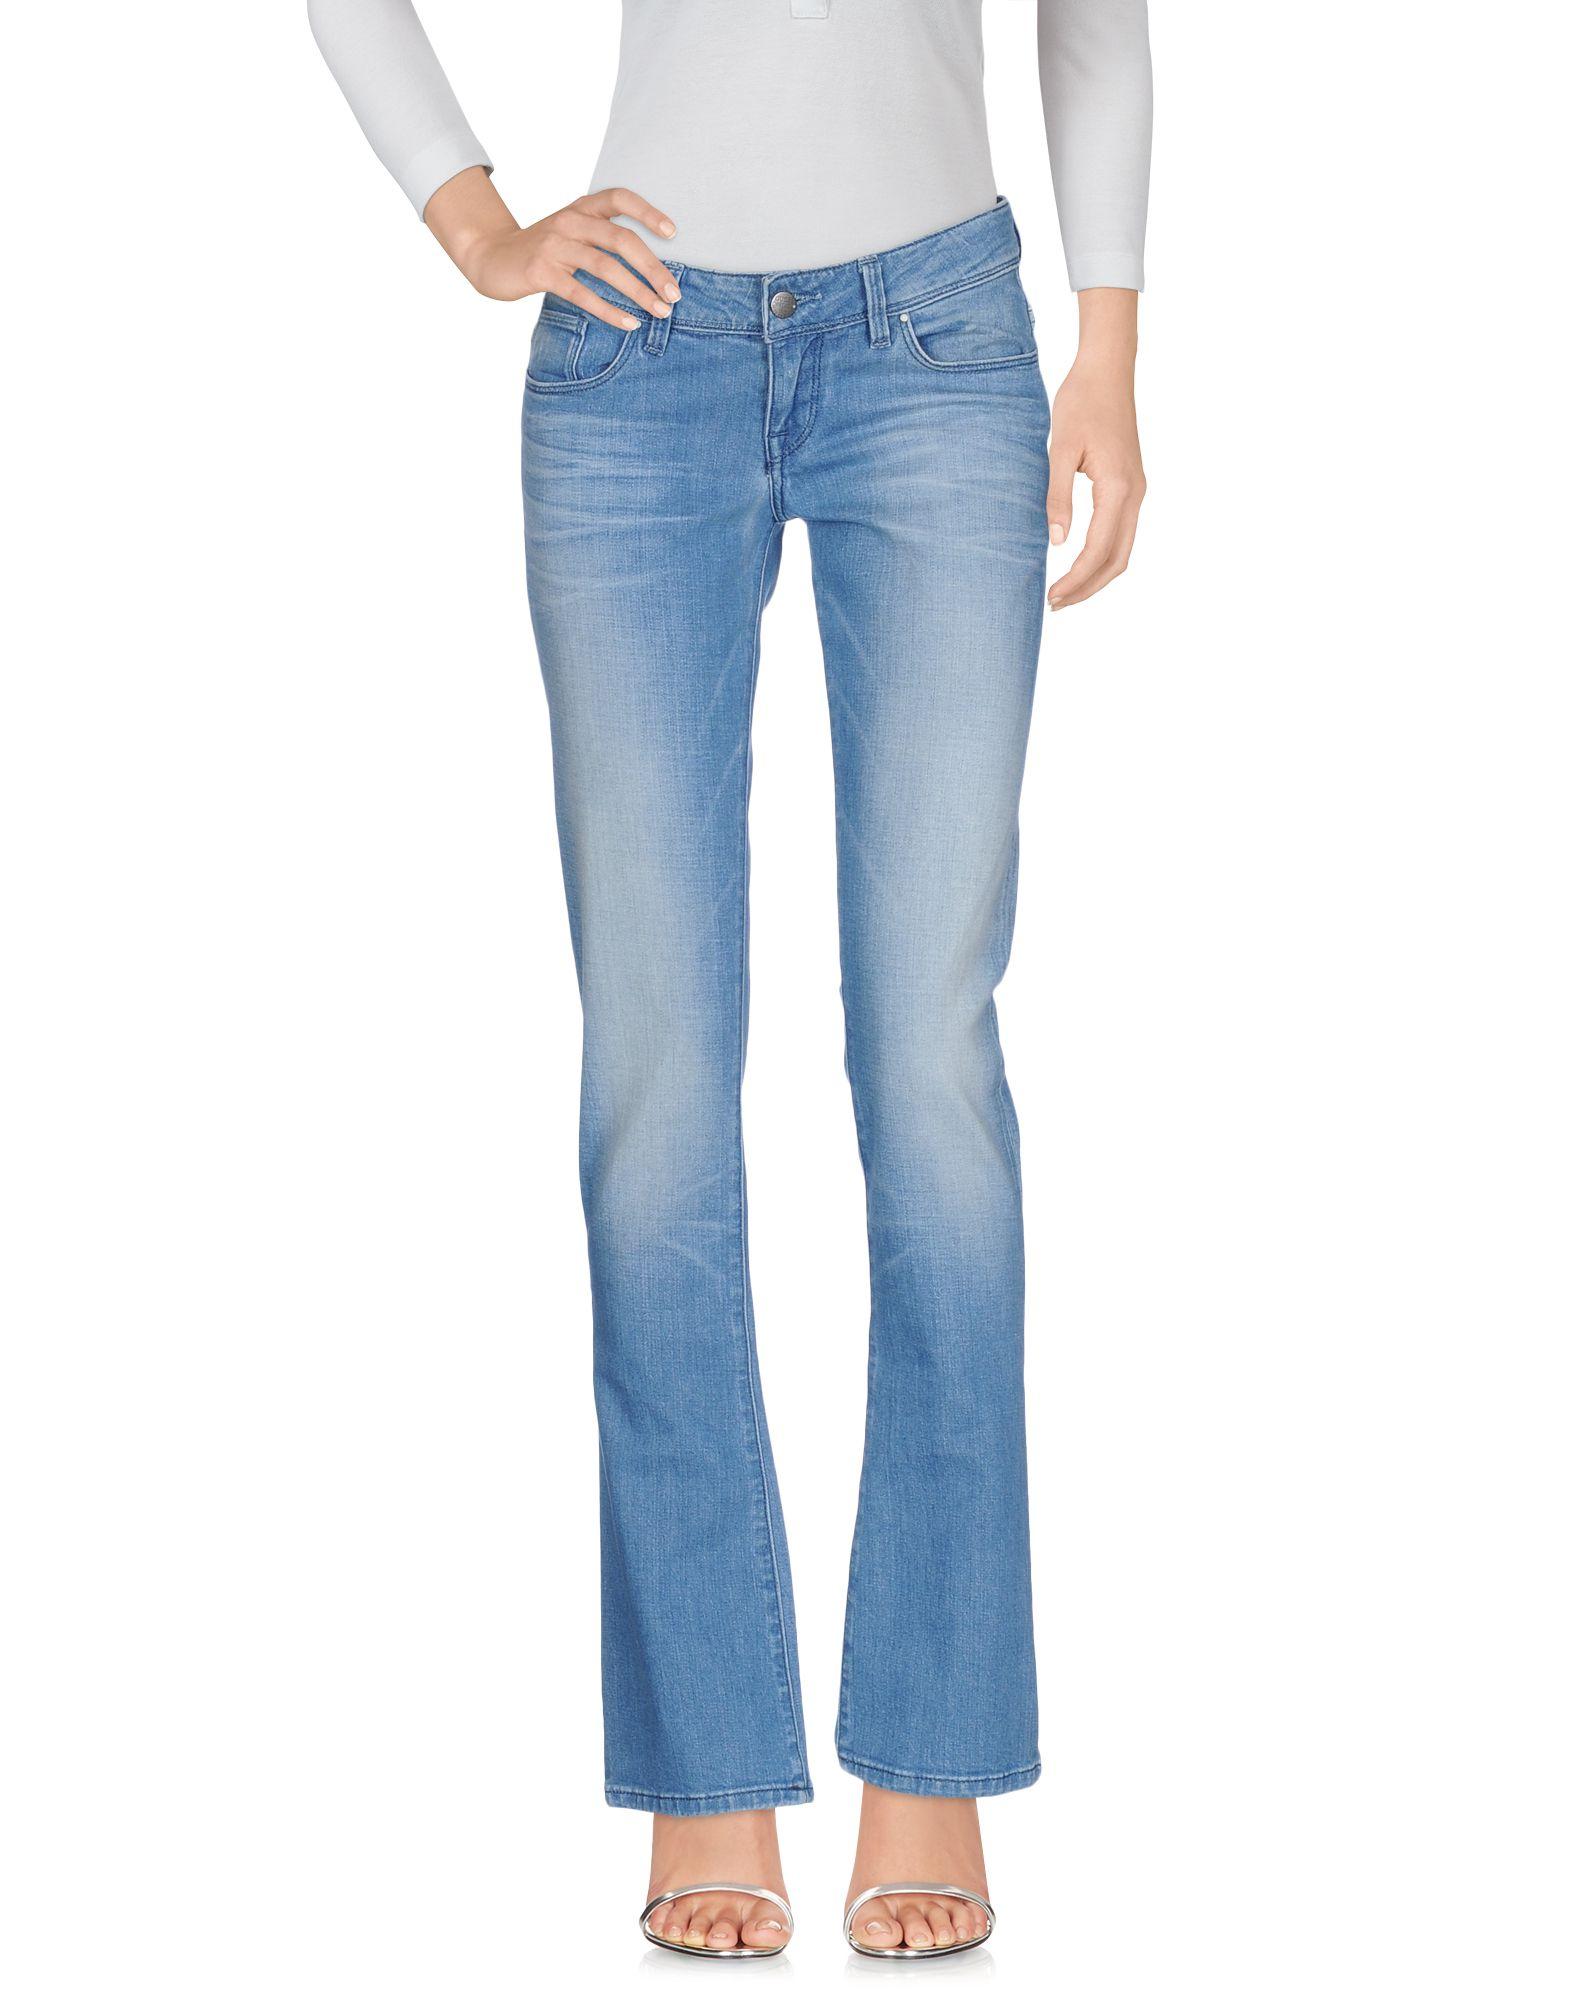 Pantaloni Jeans Guess Donna - Acquista online su BtnIQMdTu